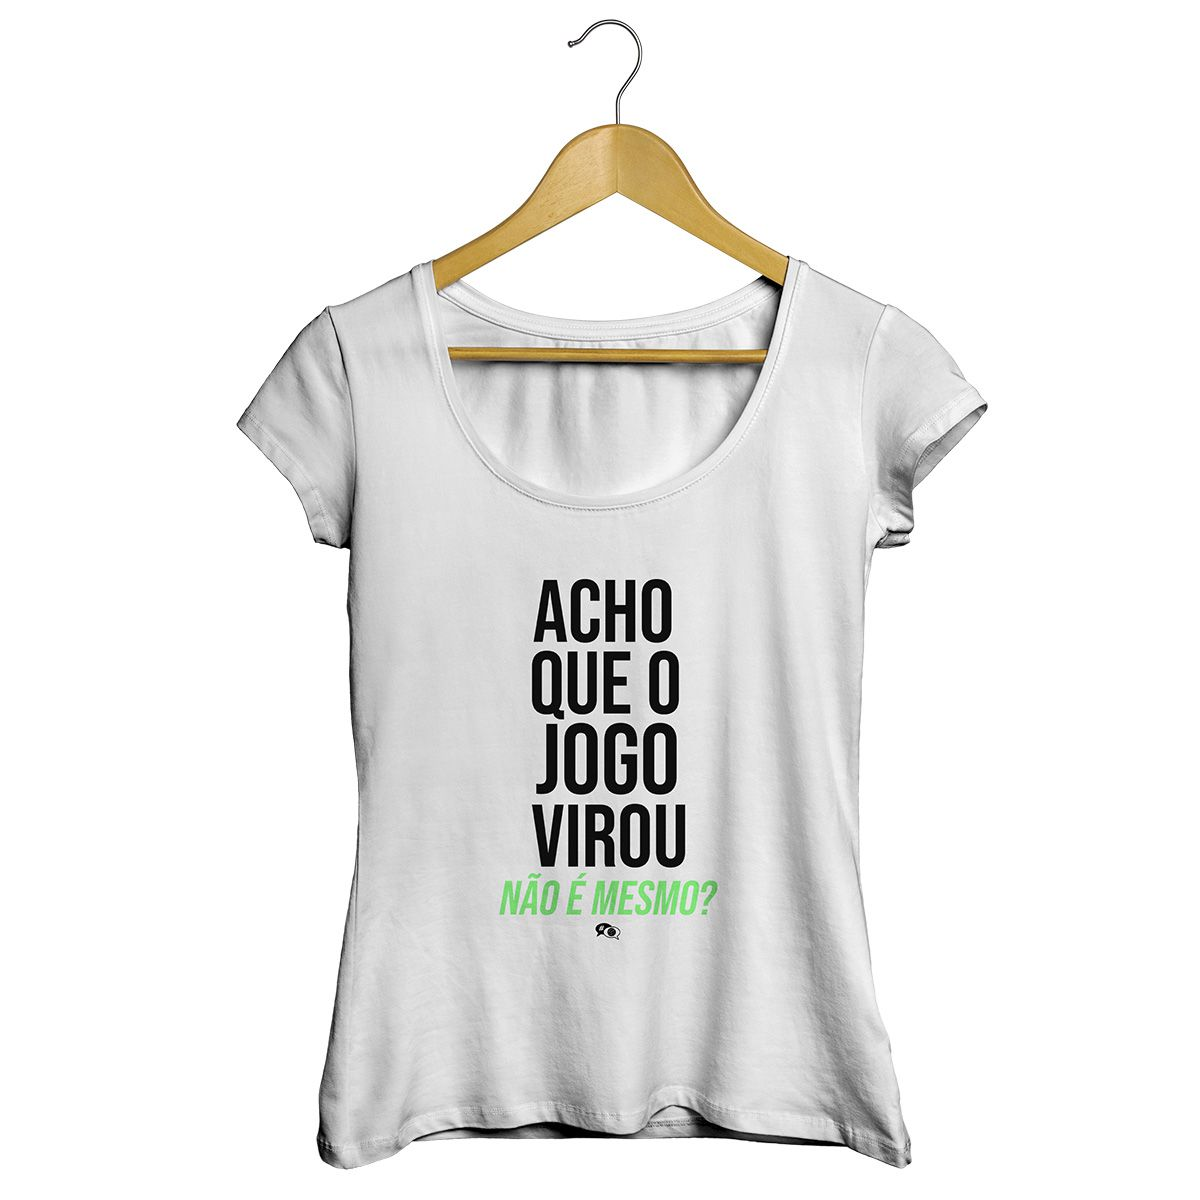 Baby Look - ACHO QUE O JOGO VIROU.